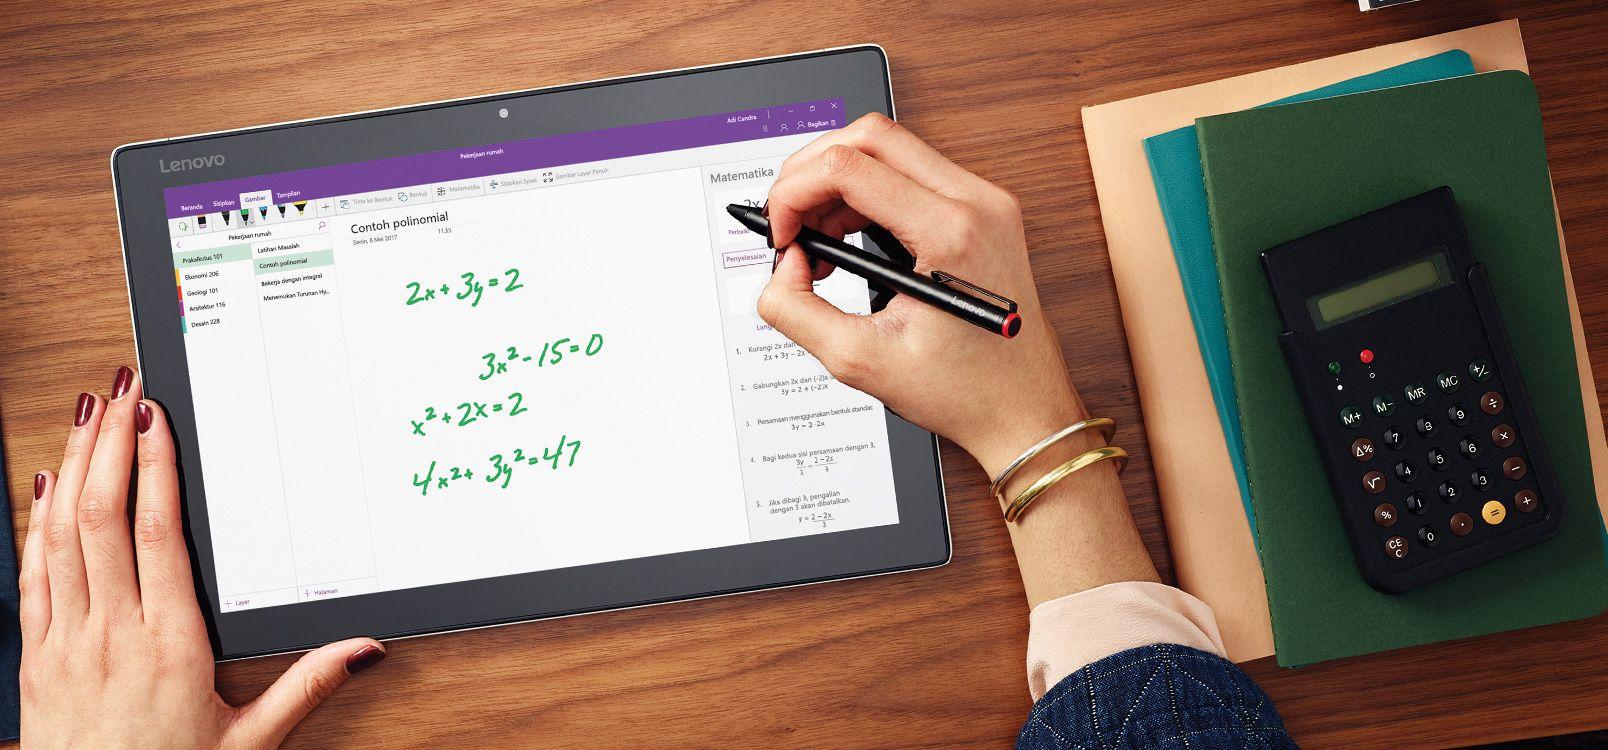 Layar tablet menampilkan OneNote dengan bantuan matematika tinta